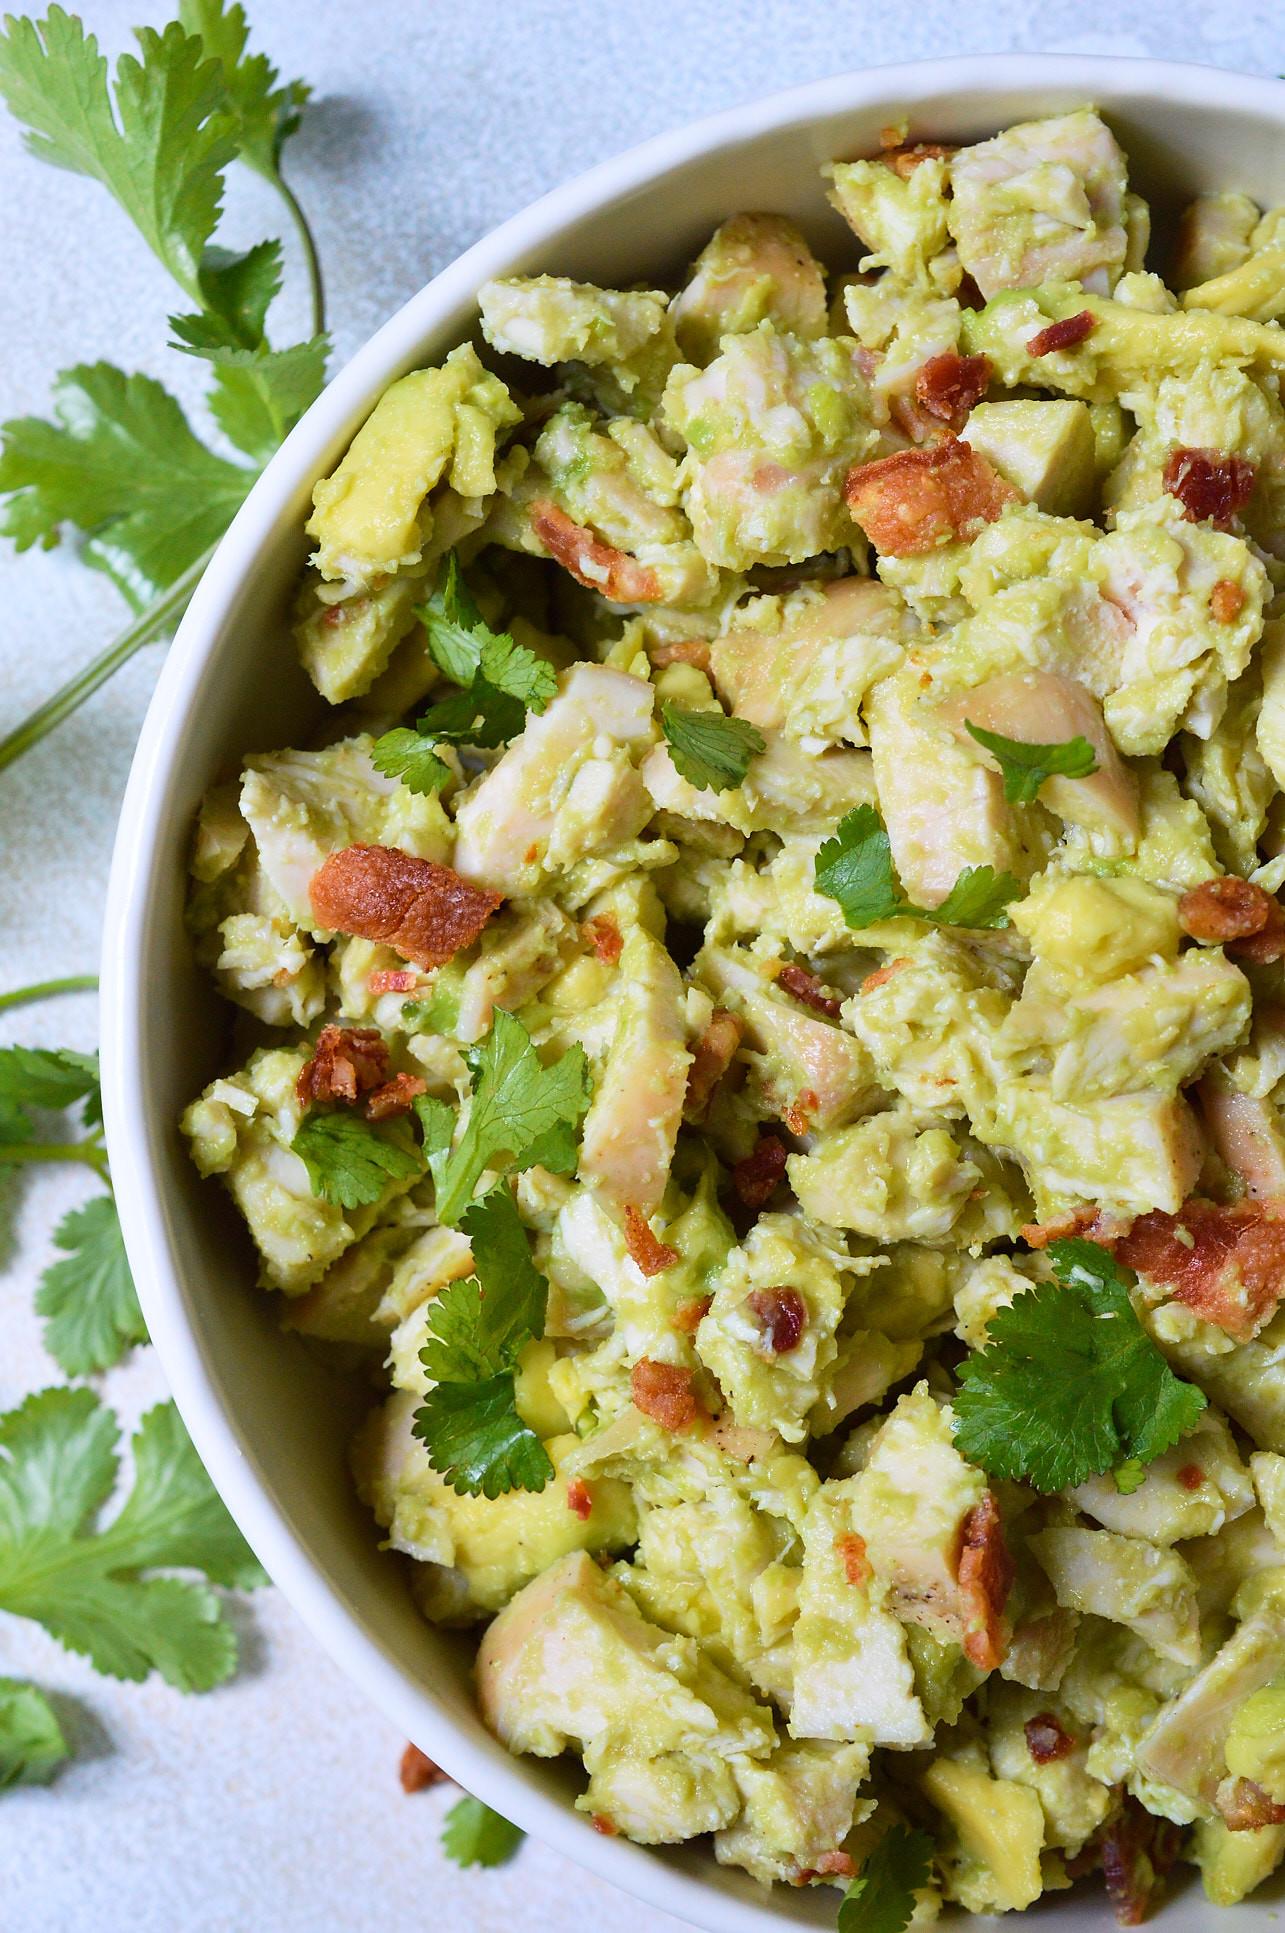 Healthy Recipes With Avocado  Bacon Avocado Chicken Salad Whole30 Recipe WonkyWonderful